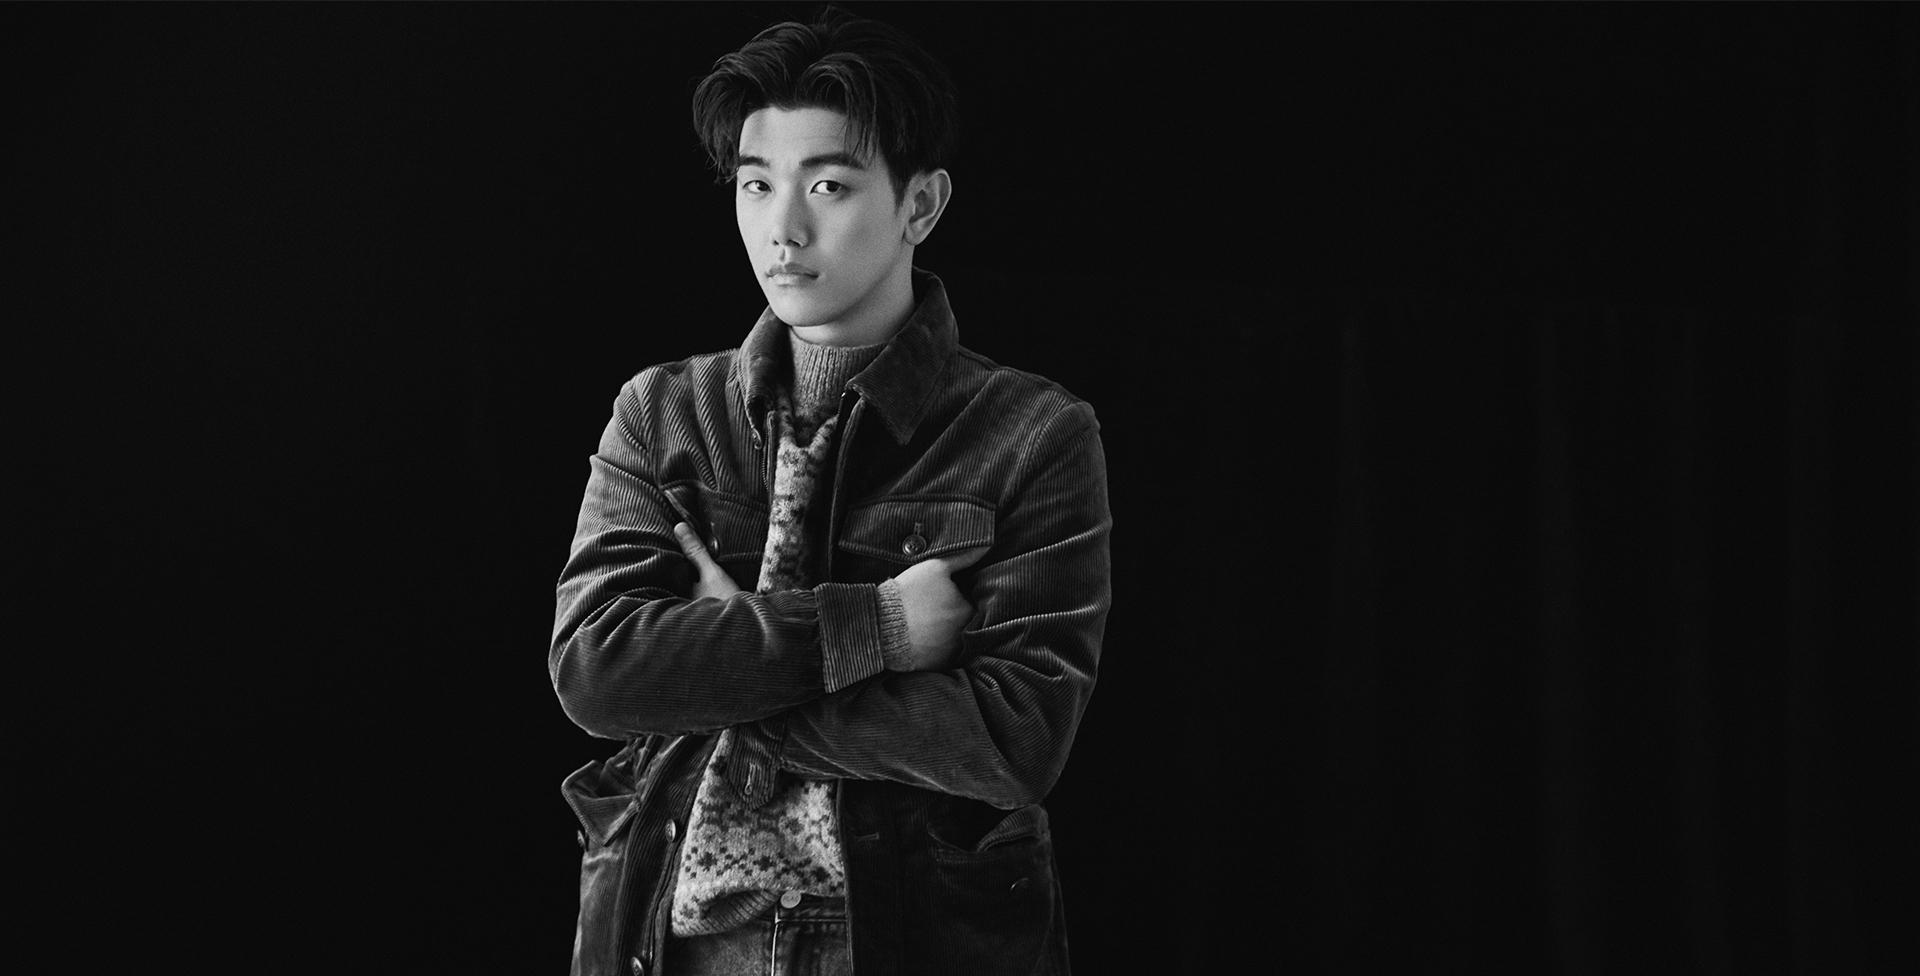 Eric Nam - Men's Style Council Member